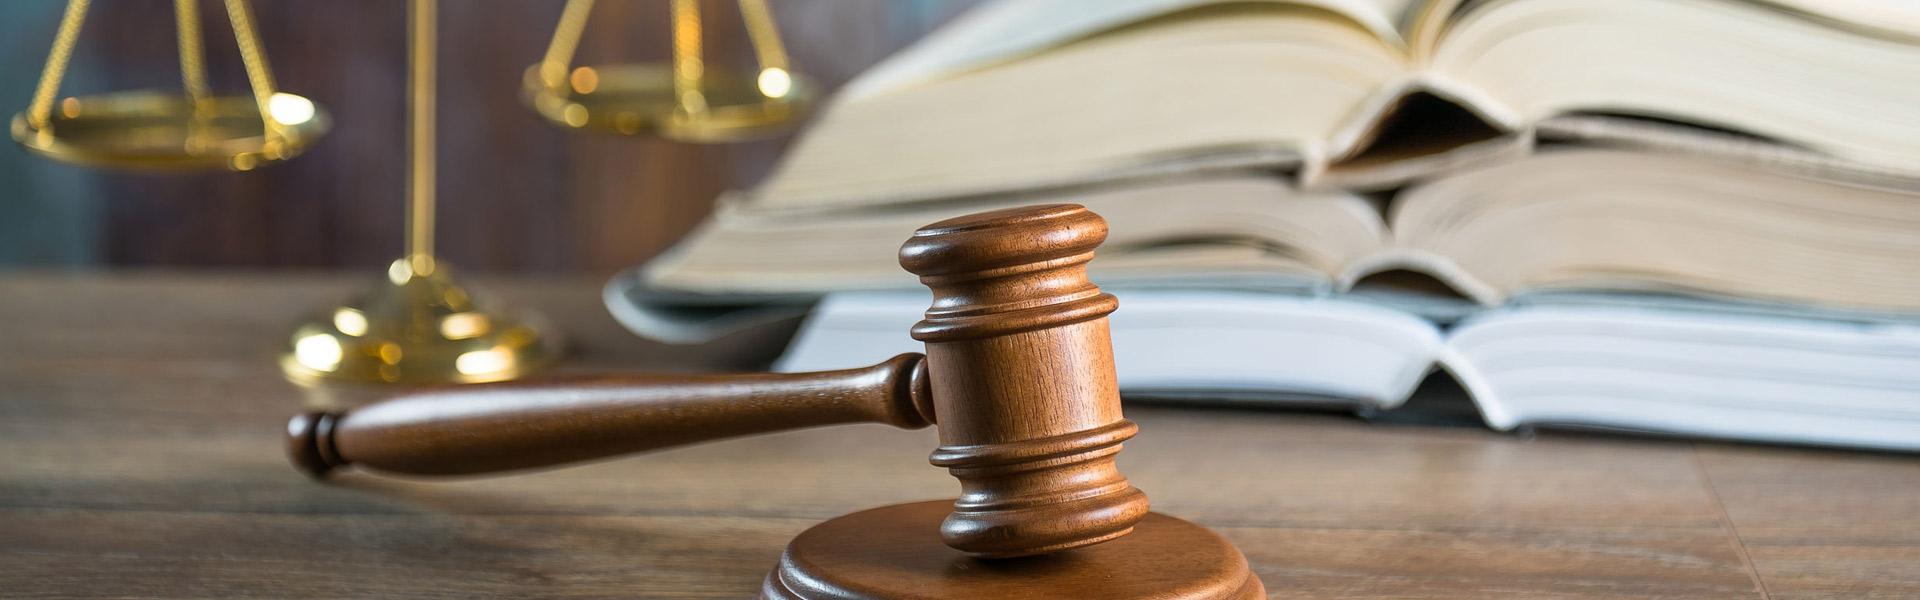 Asesoría Jurídica en Zaragoza